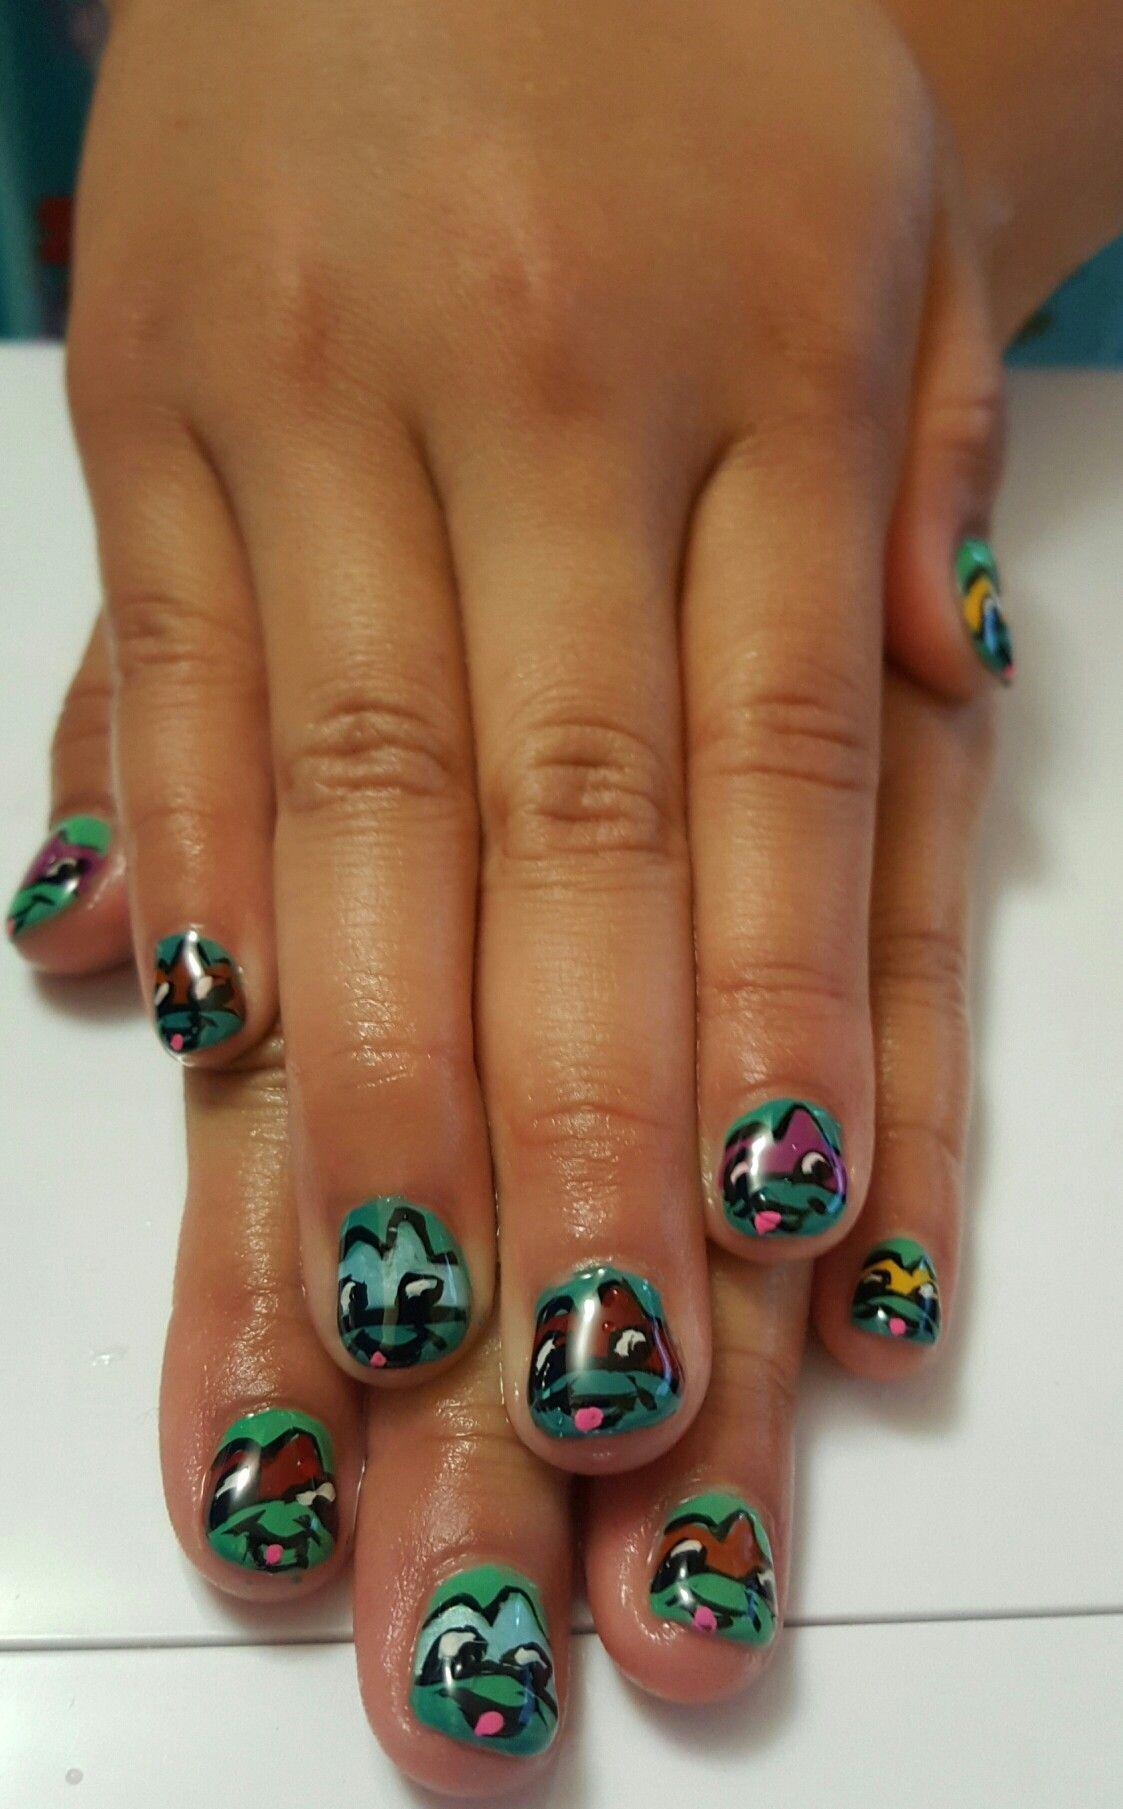 Teenage ninja Turtles   Nails design by Hip Hop nails   Pinterest ...